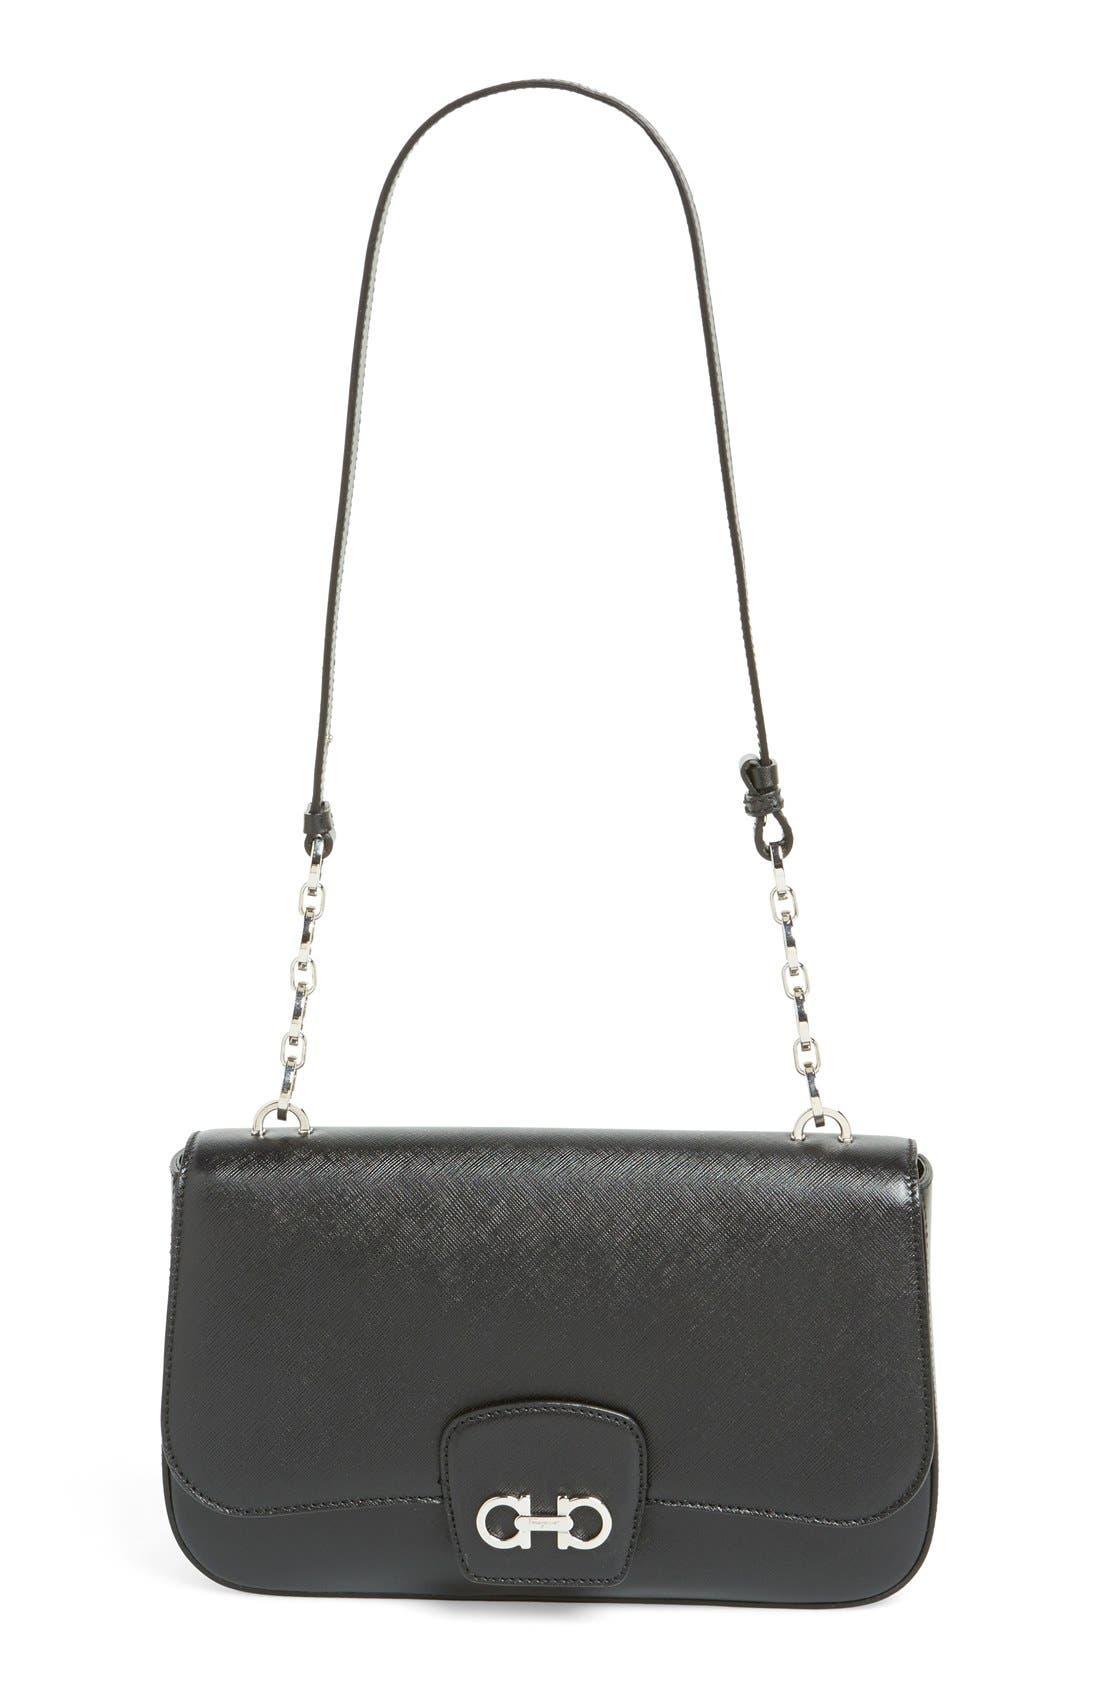 Main Image - Salvatore Ferragamo 'Bree' Shoulder Bag